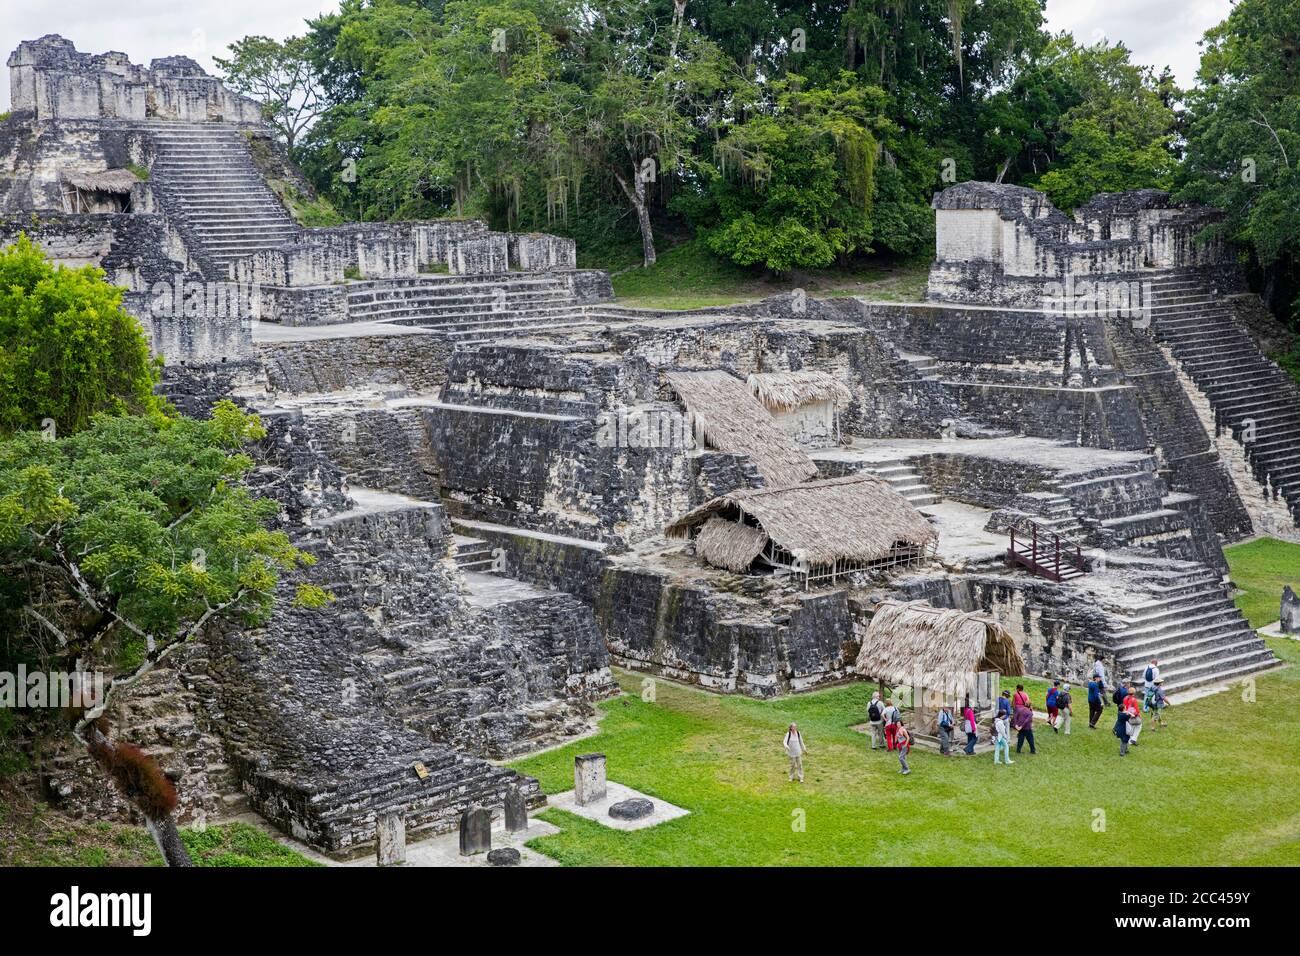 North Acropolis of Tikal / Yax Mutal, ancient Maya city near the town Flores, Petén Department, Guatemala, Central America Stock Photo